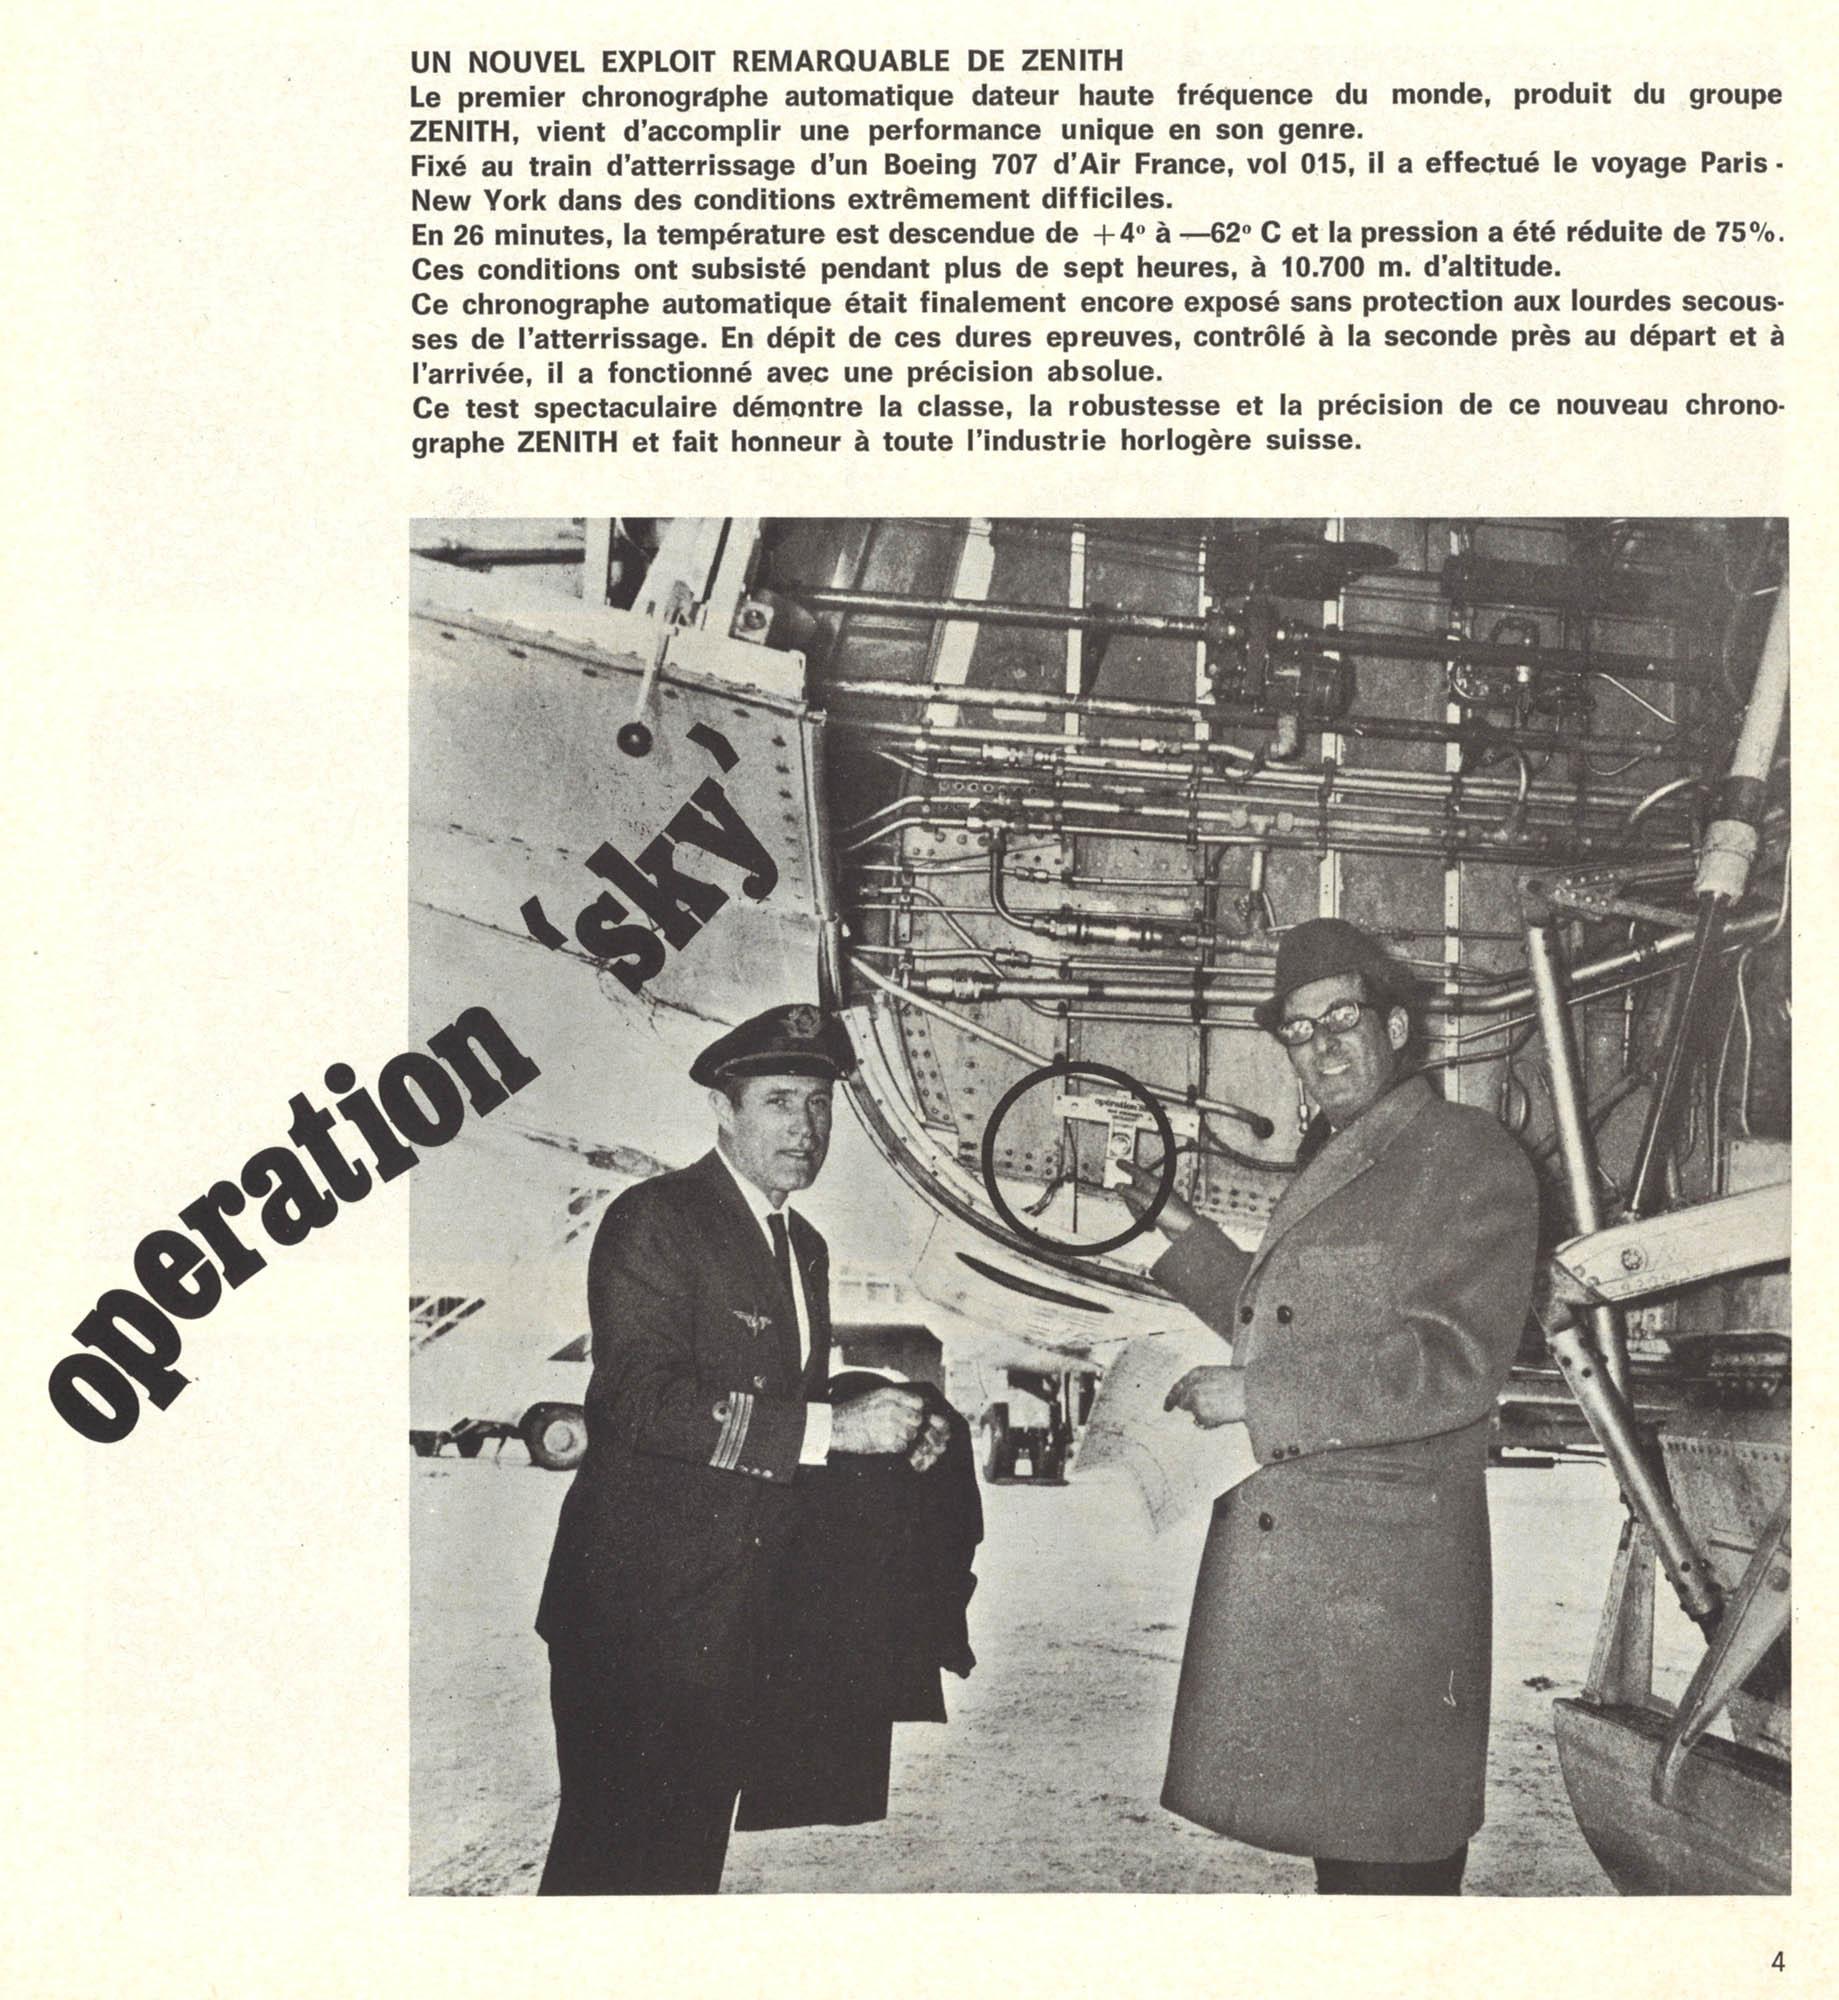 Zenith A385 original El Primero Chronograph 1970 advertisement Operation Sky landing gear Boeing 707 Air France